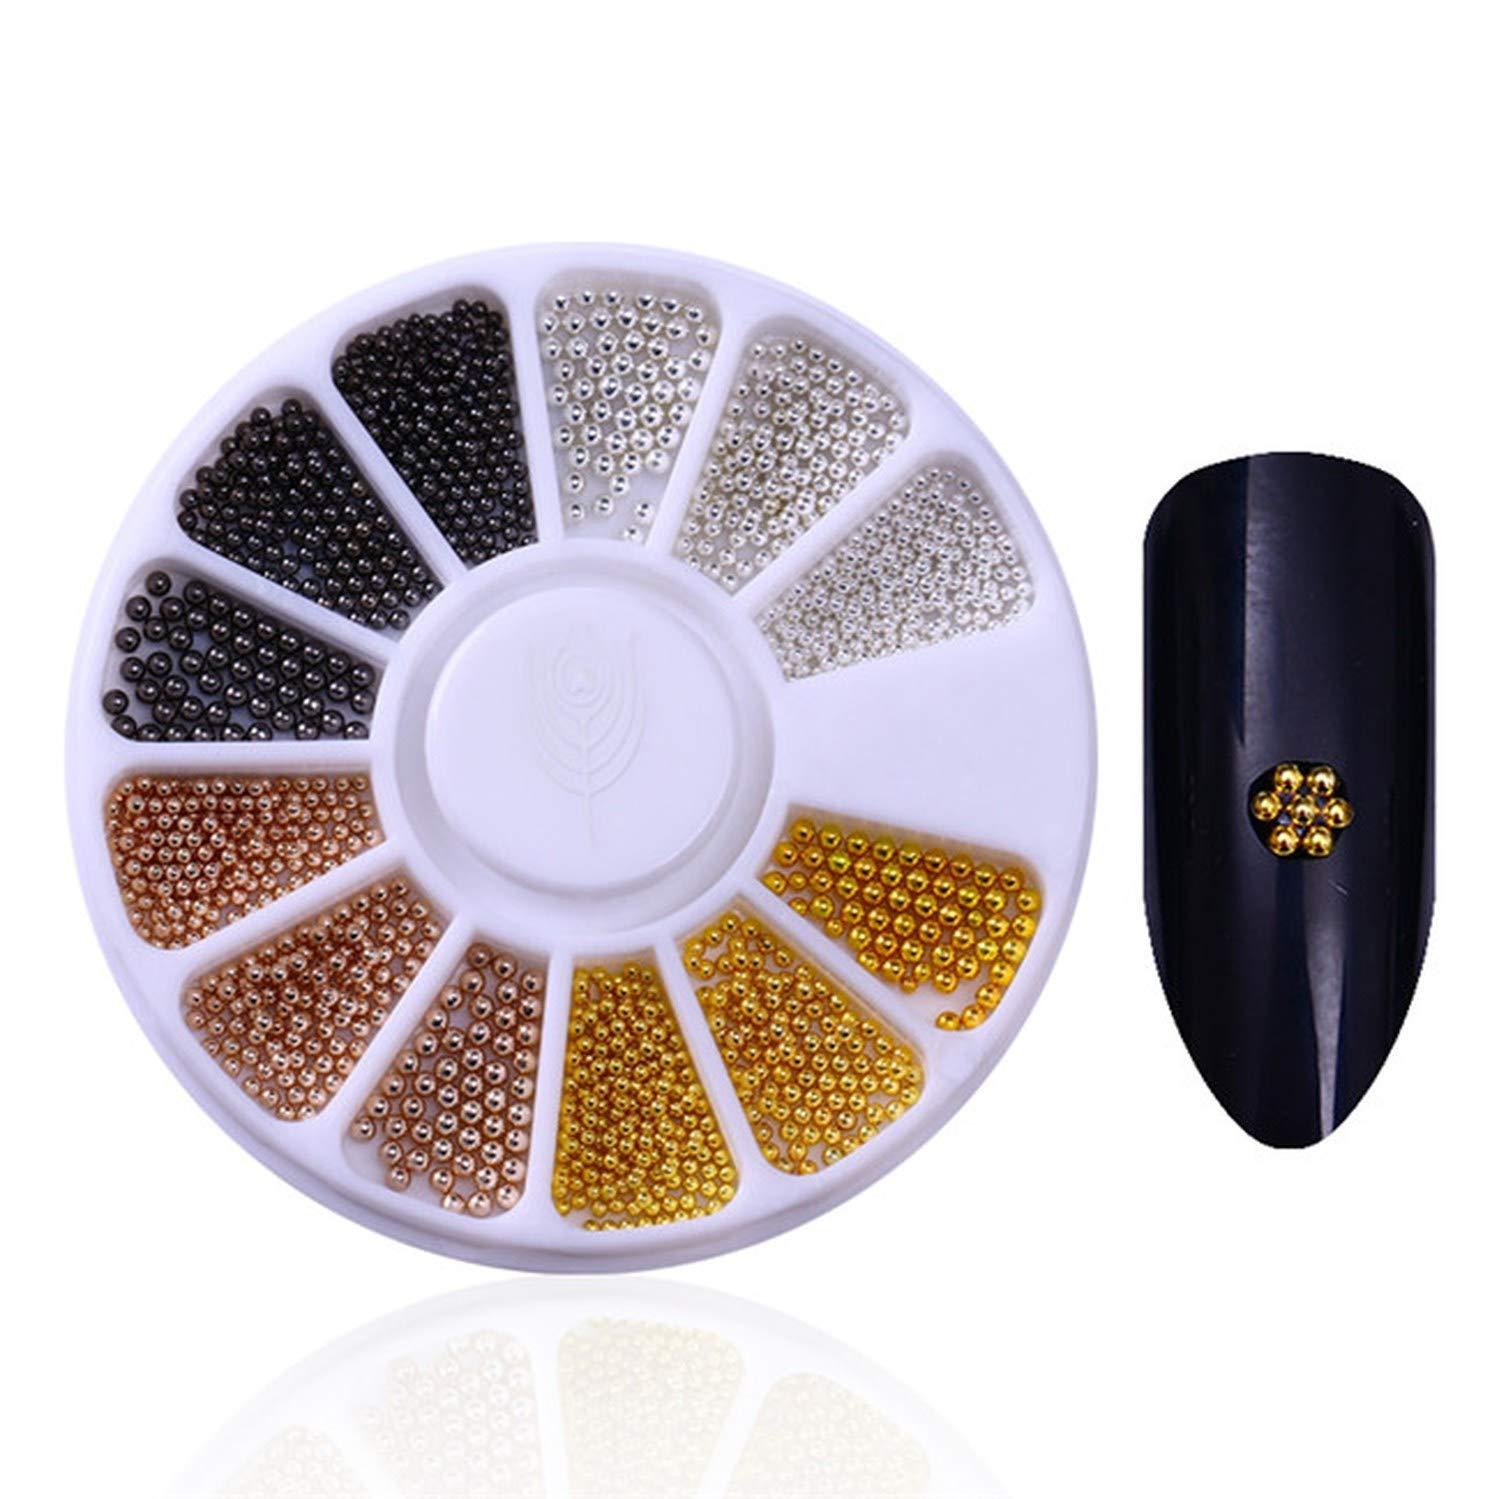 Mixed Silver Round Nail Art Decoration in Wheel Nail Rhinestones for Acrylic UV Gel Shining Body Art Nail Accessories,Caviar Beads